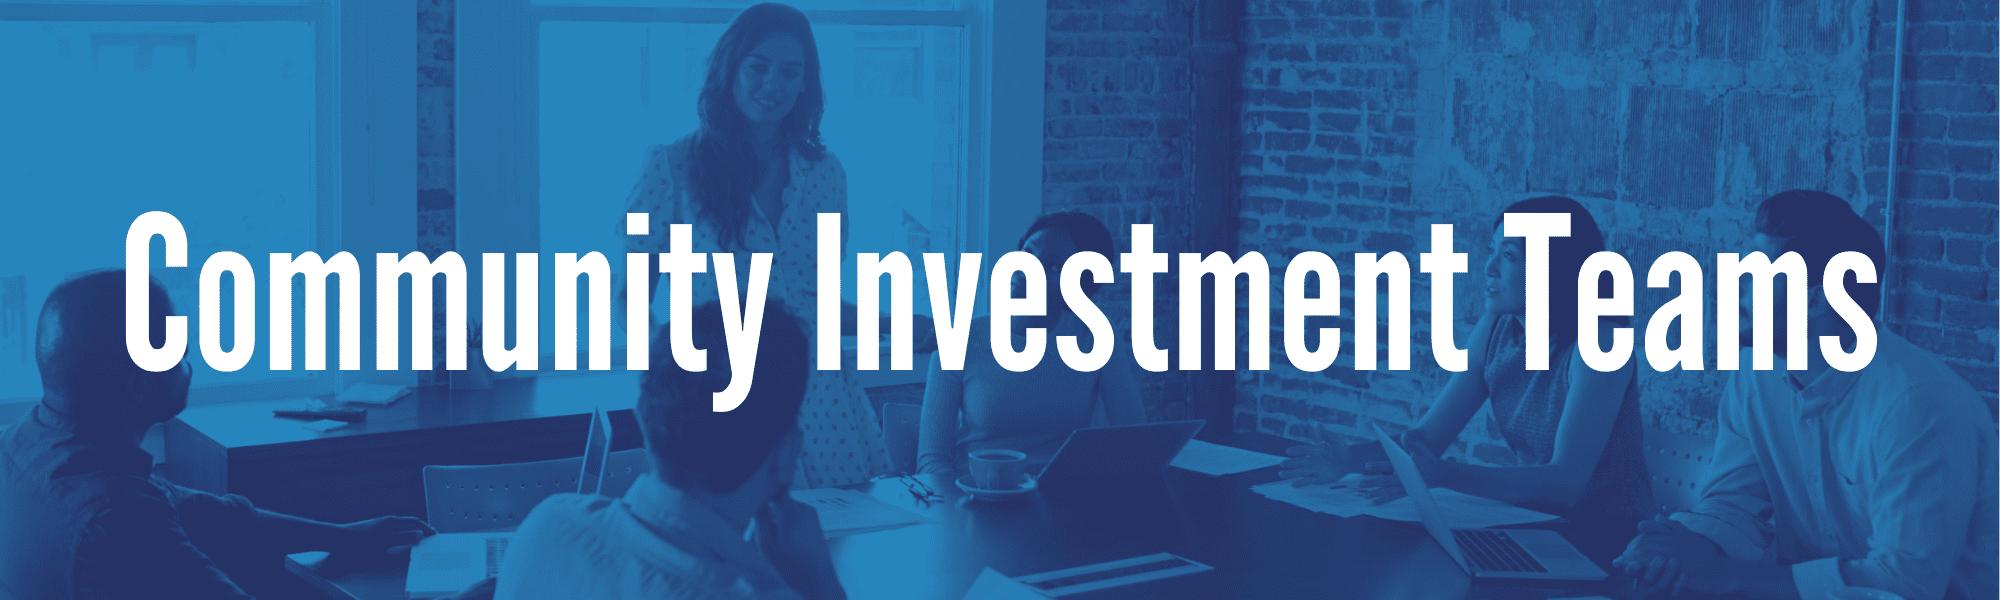 Community Investment Team